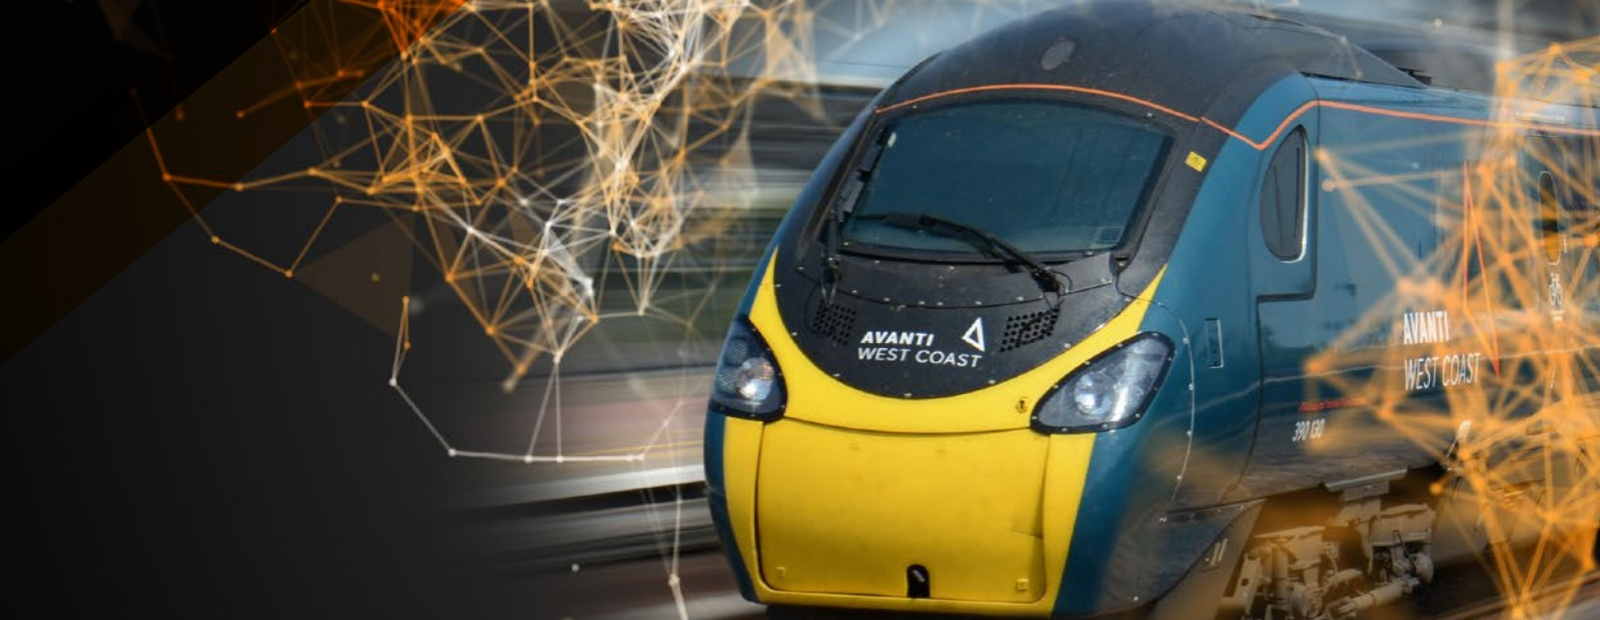 McLaren Applied secures landmark contract with Avanti West Coast